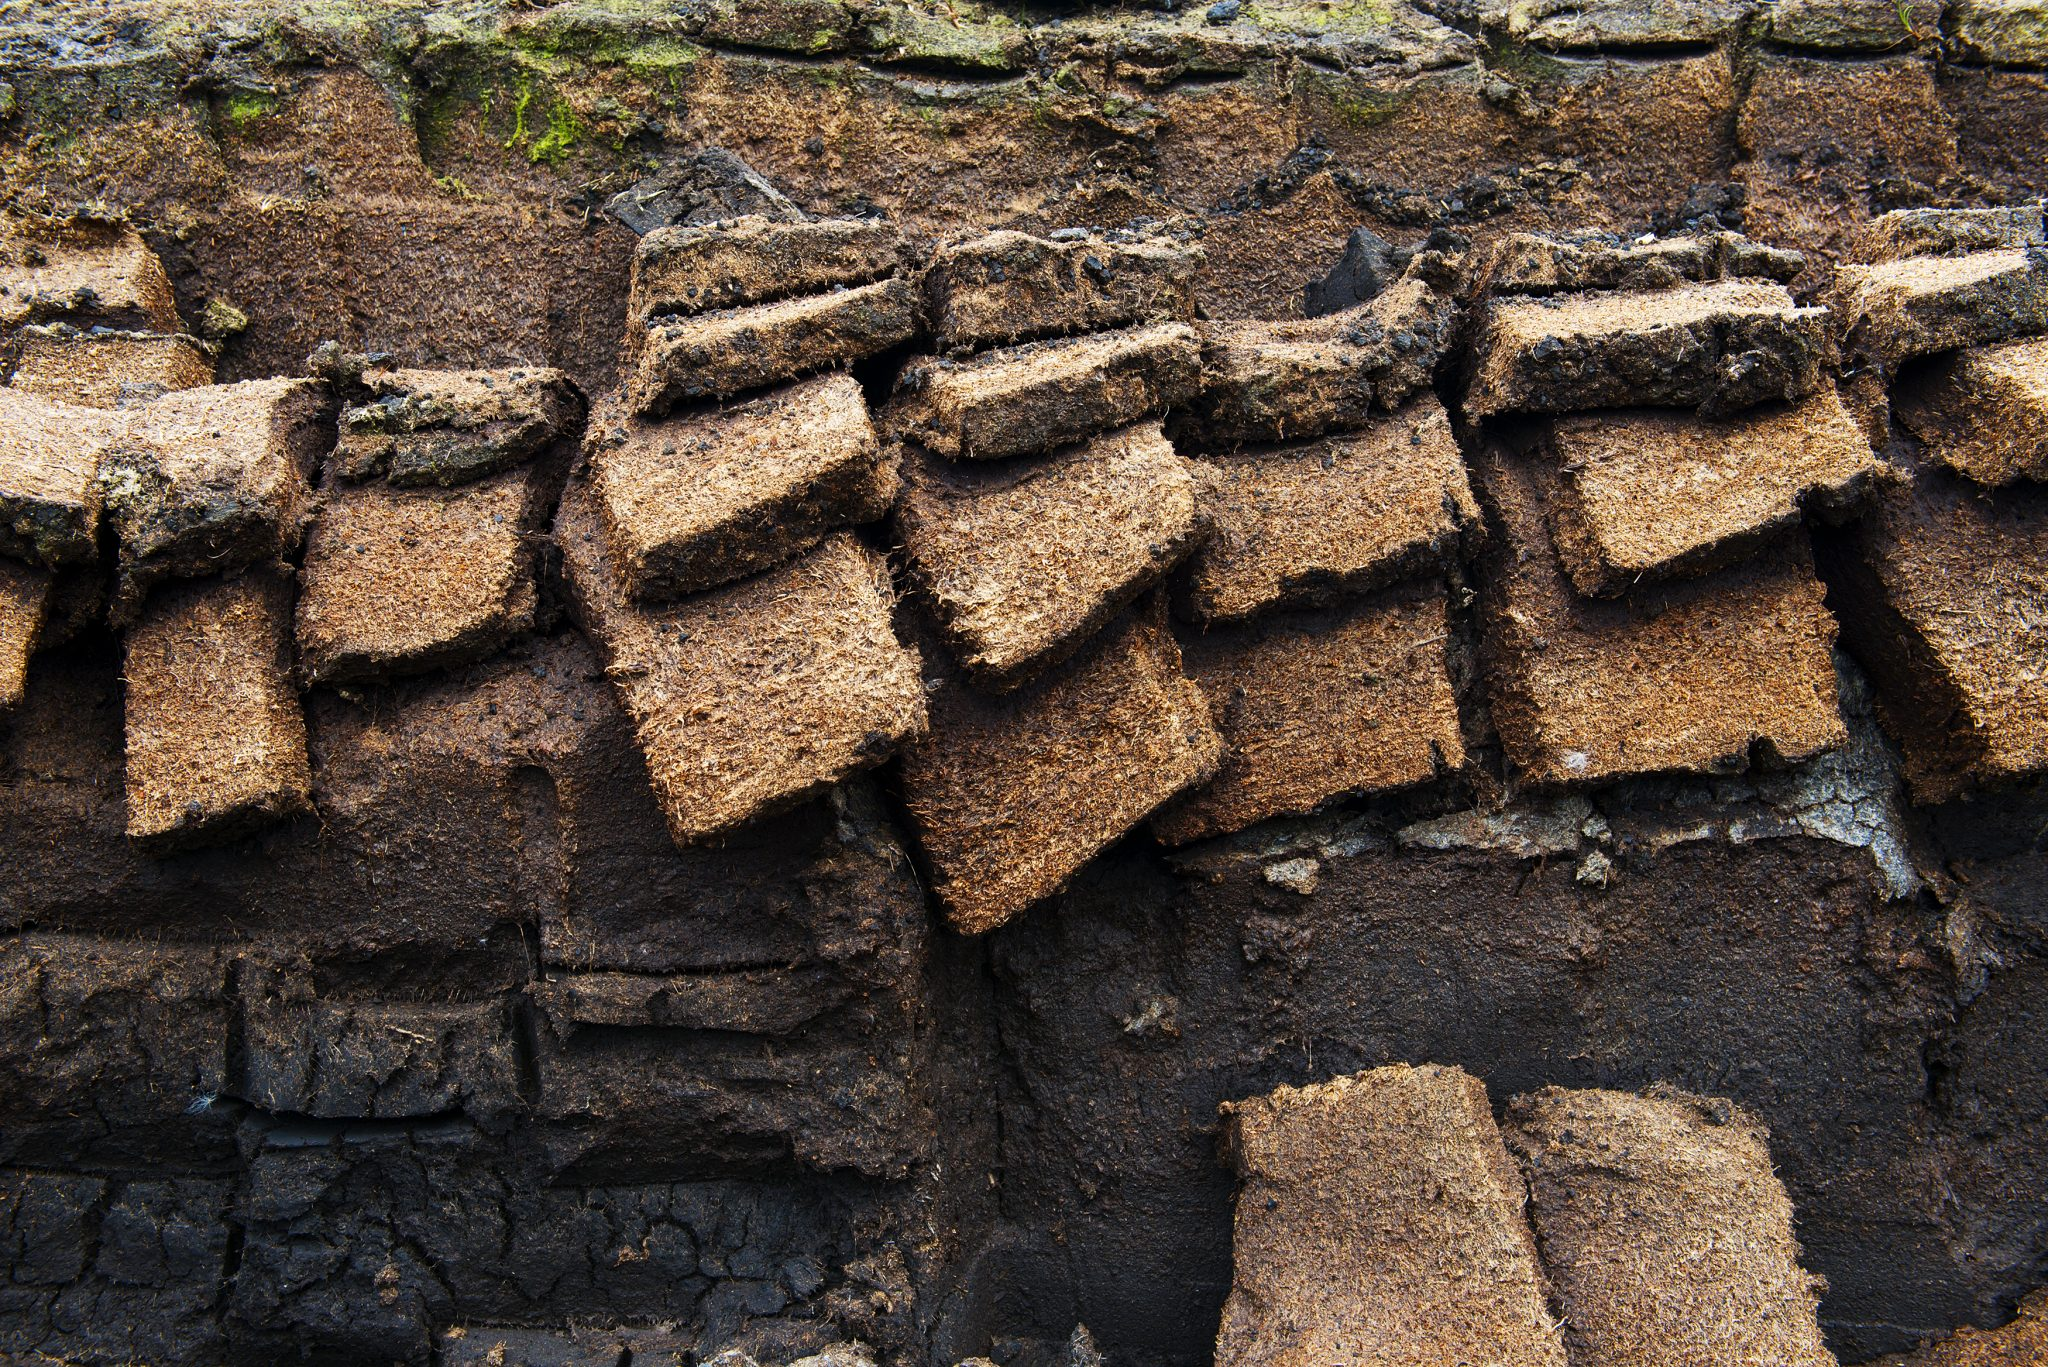 Harvesting peat